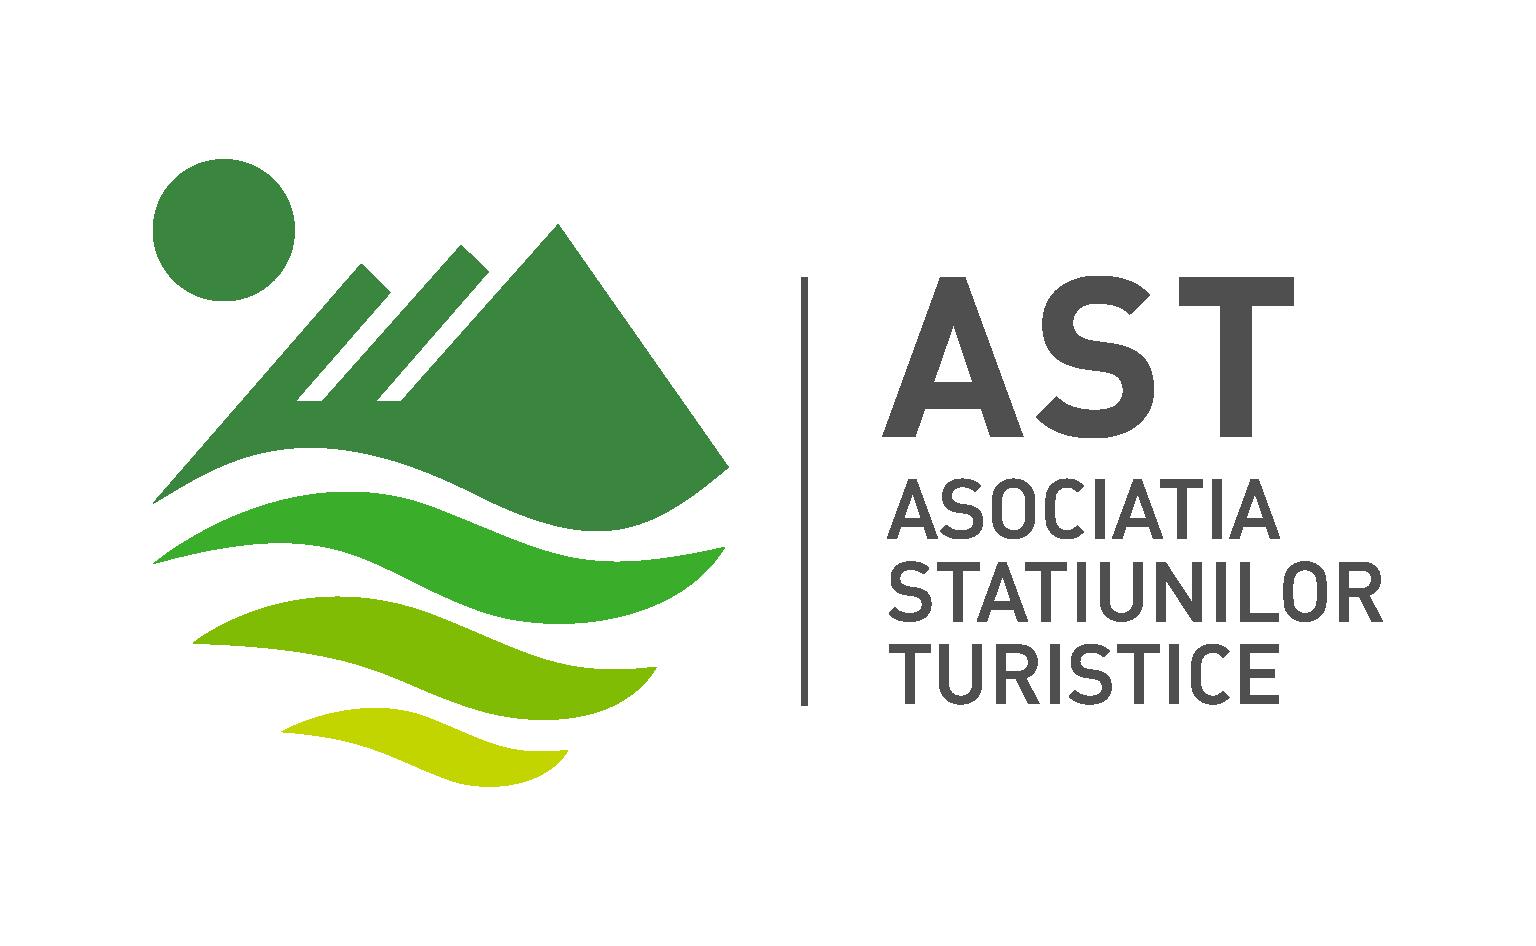 Asociatia Statiunilor Turistice logo